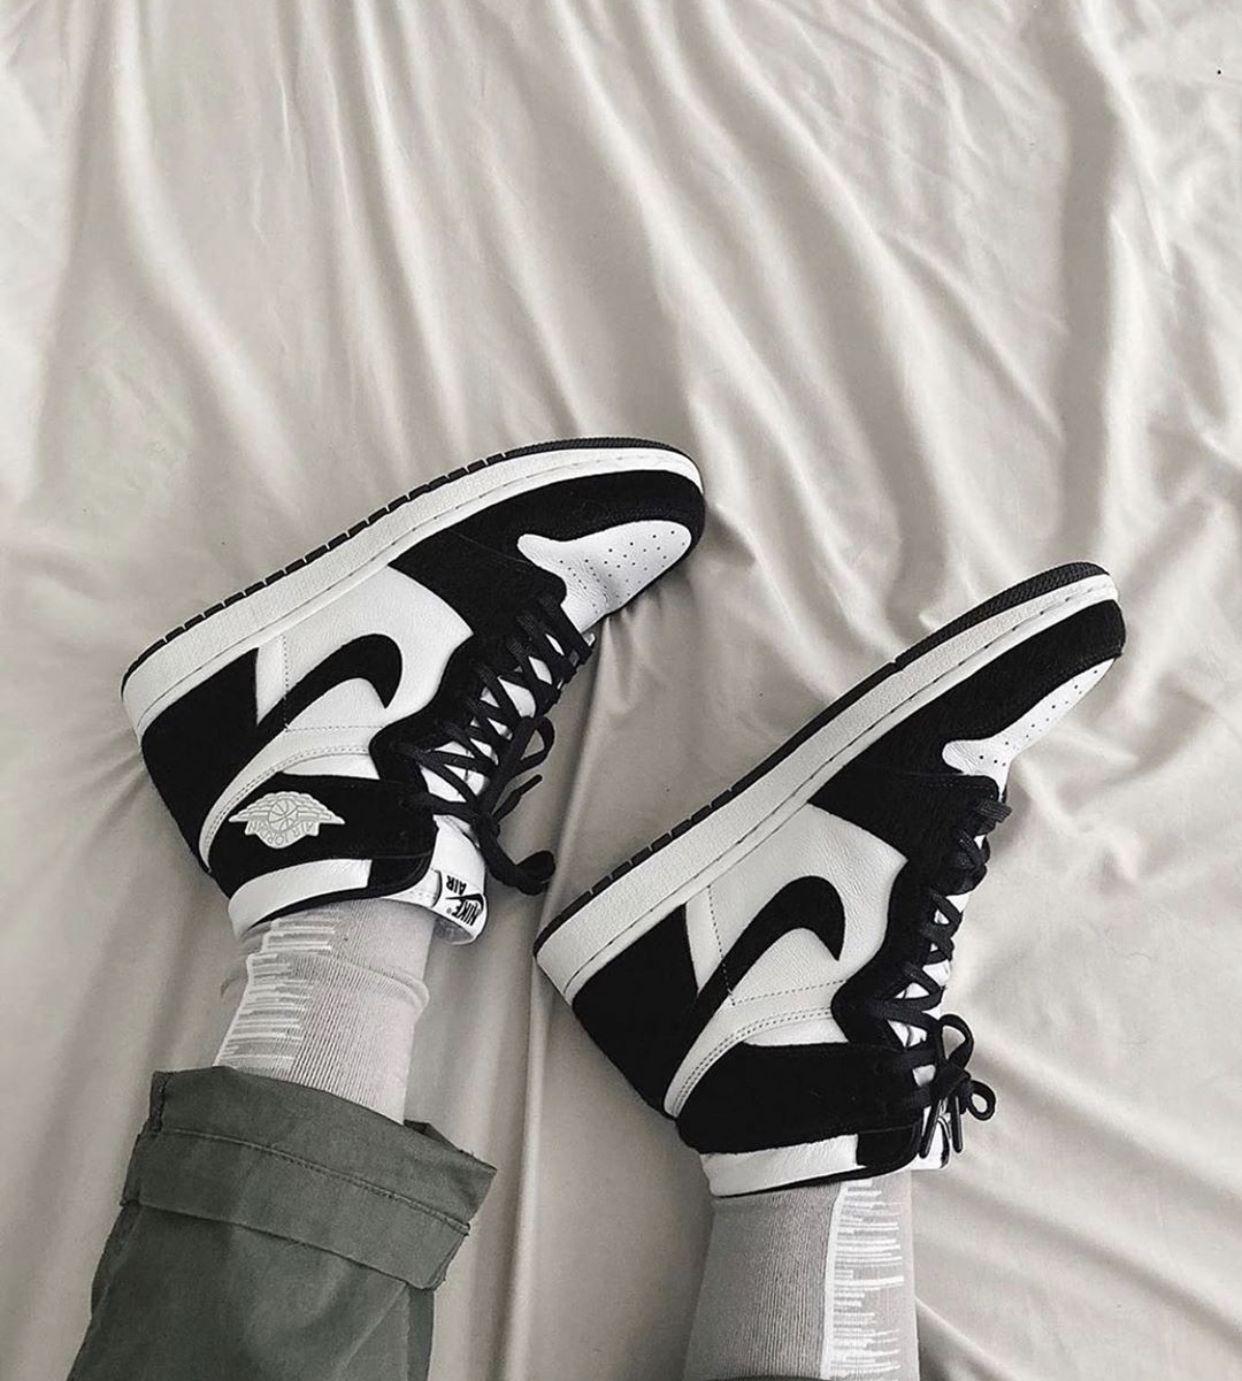 vsco + chynamcghee in 2020 Sneakers fashion, Nike air